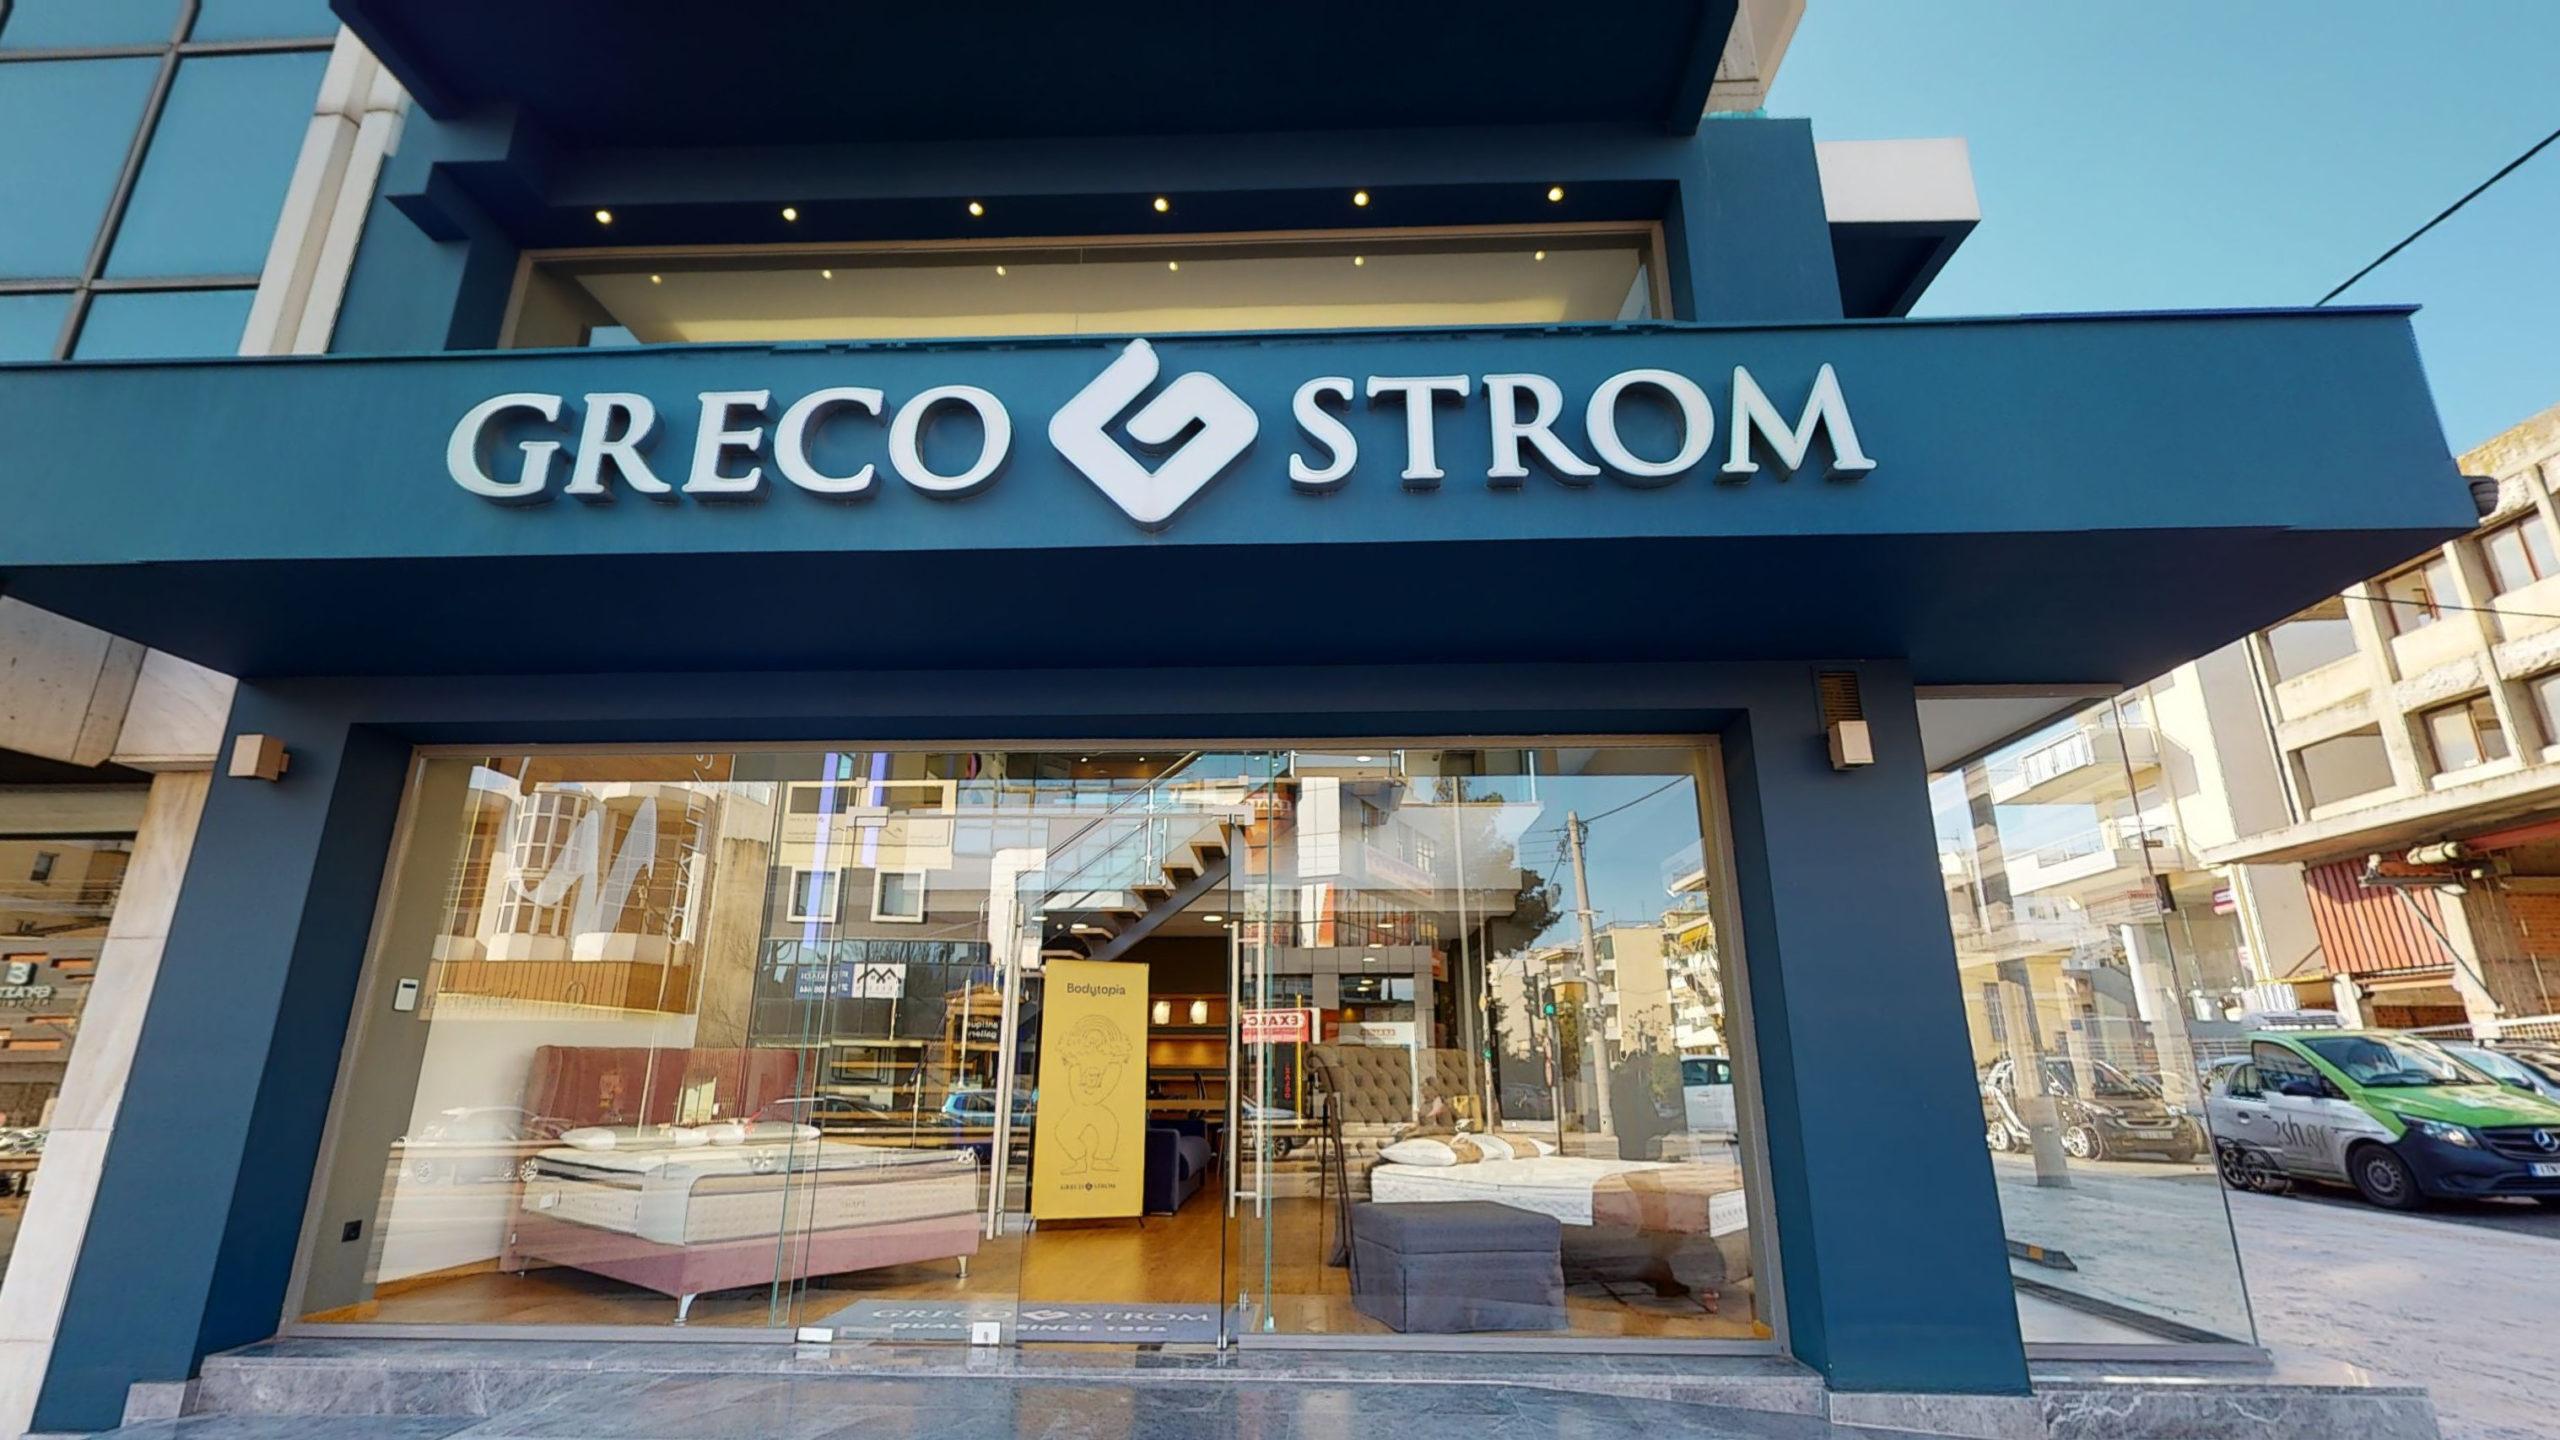 GRECO-STROM-Showroom-02282021_112540